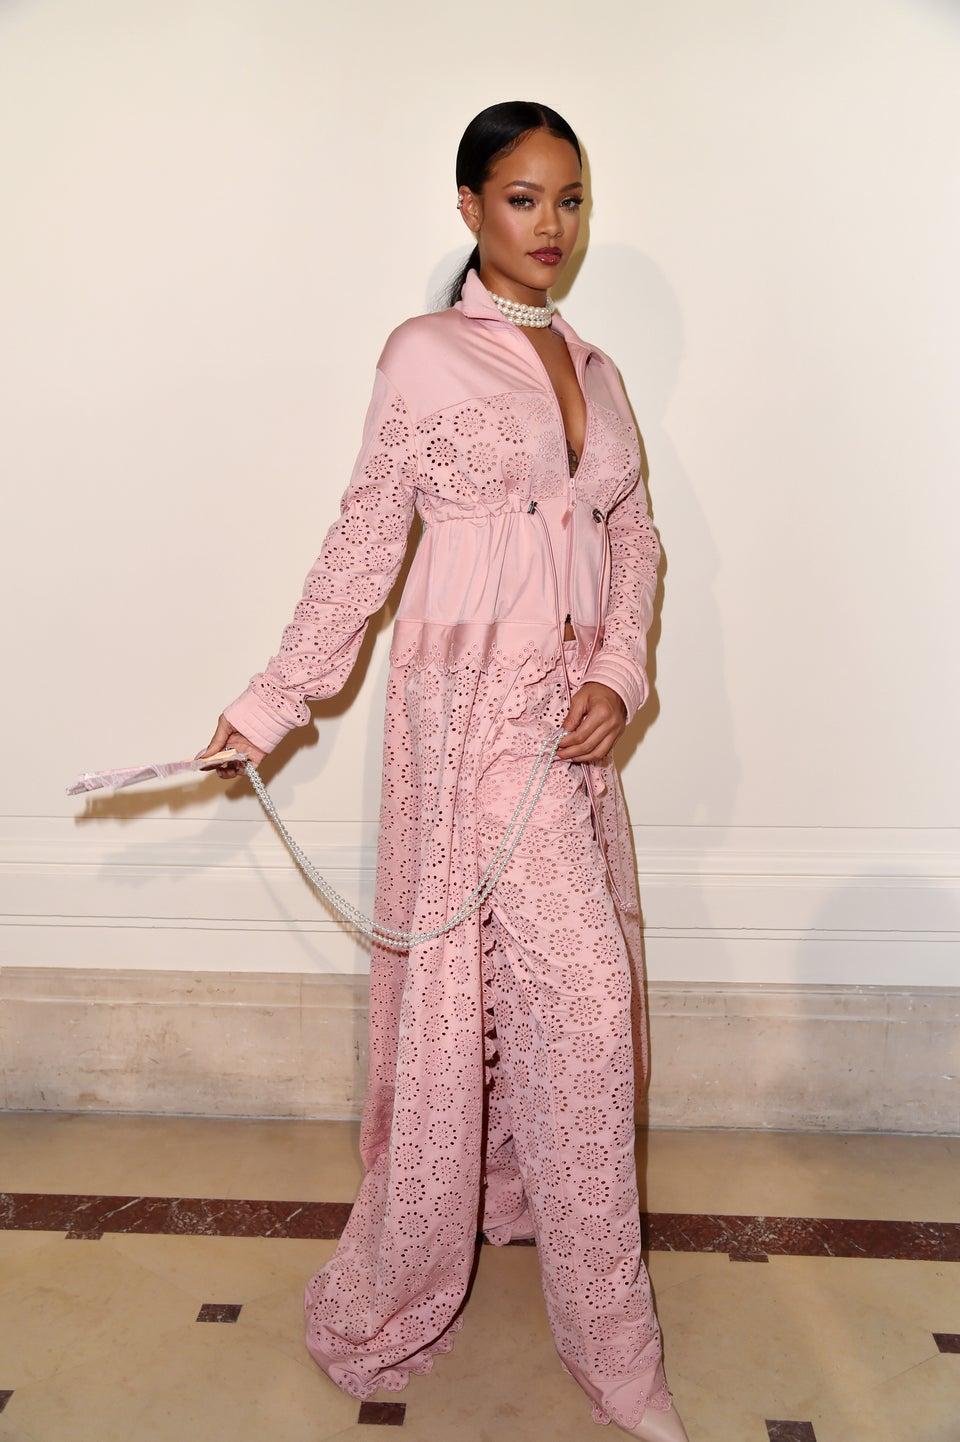 Rihanna Drops Much Anticipated Spring FENTY X PUMA Collection